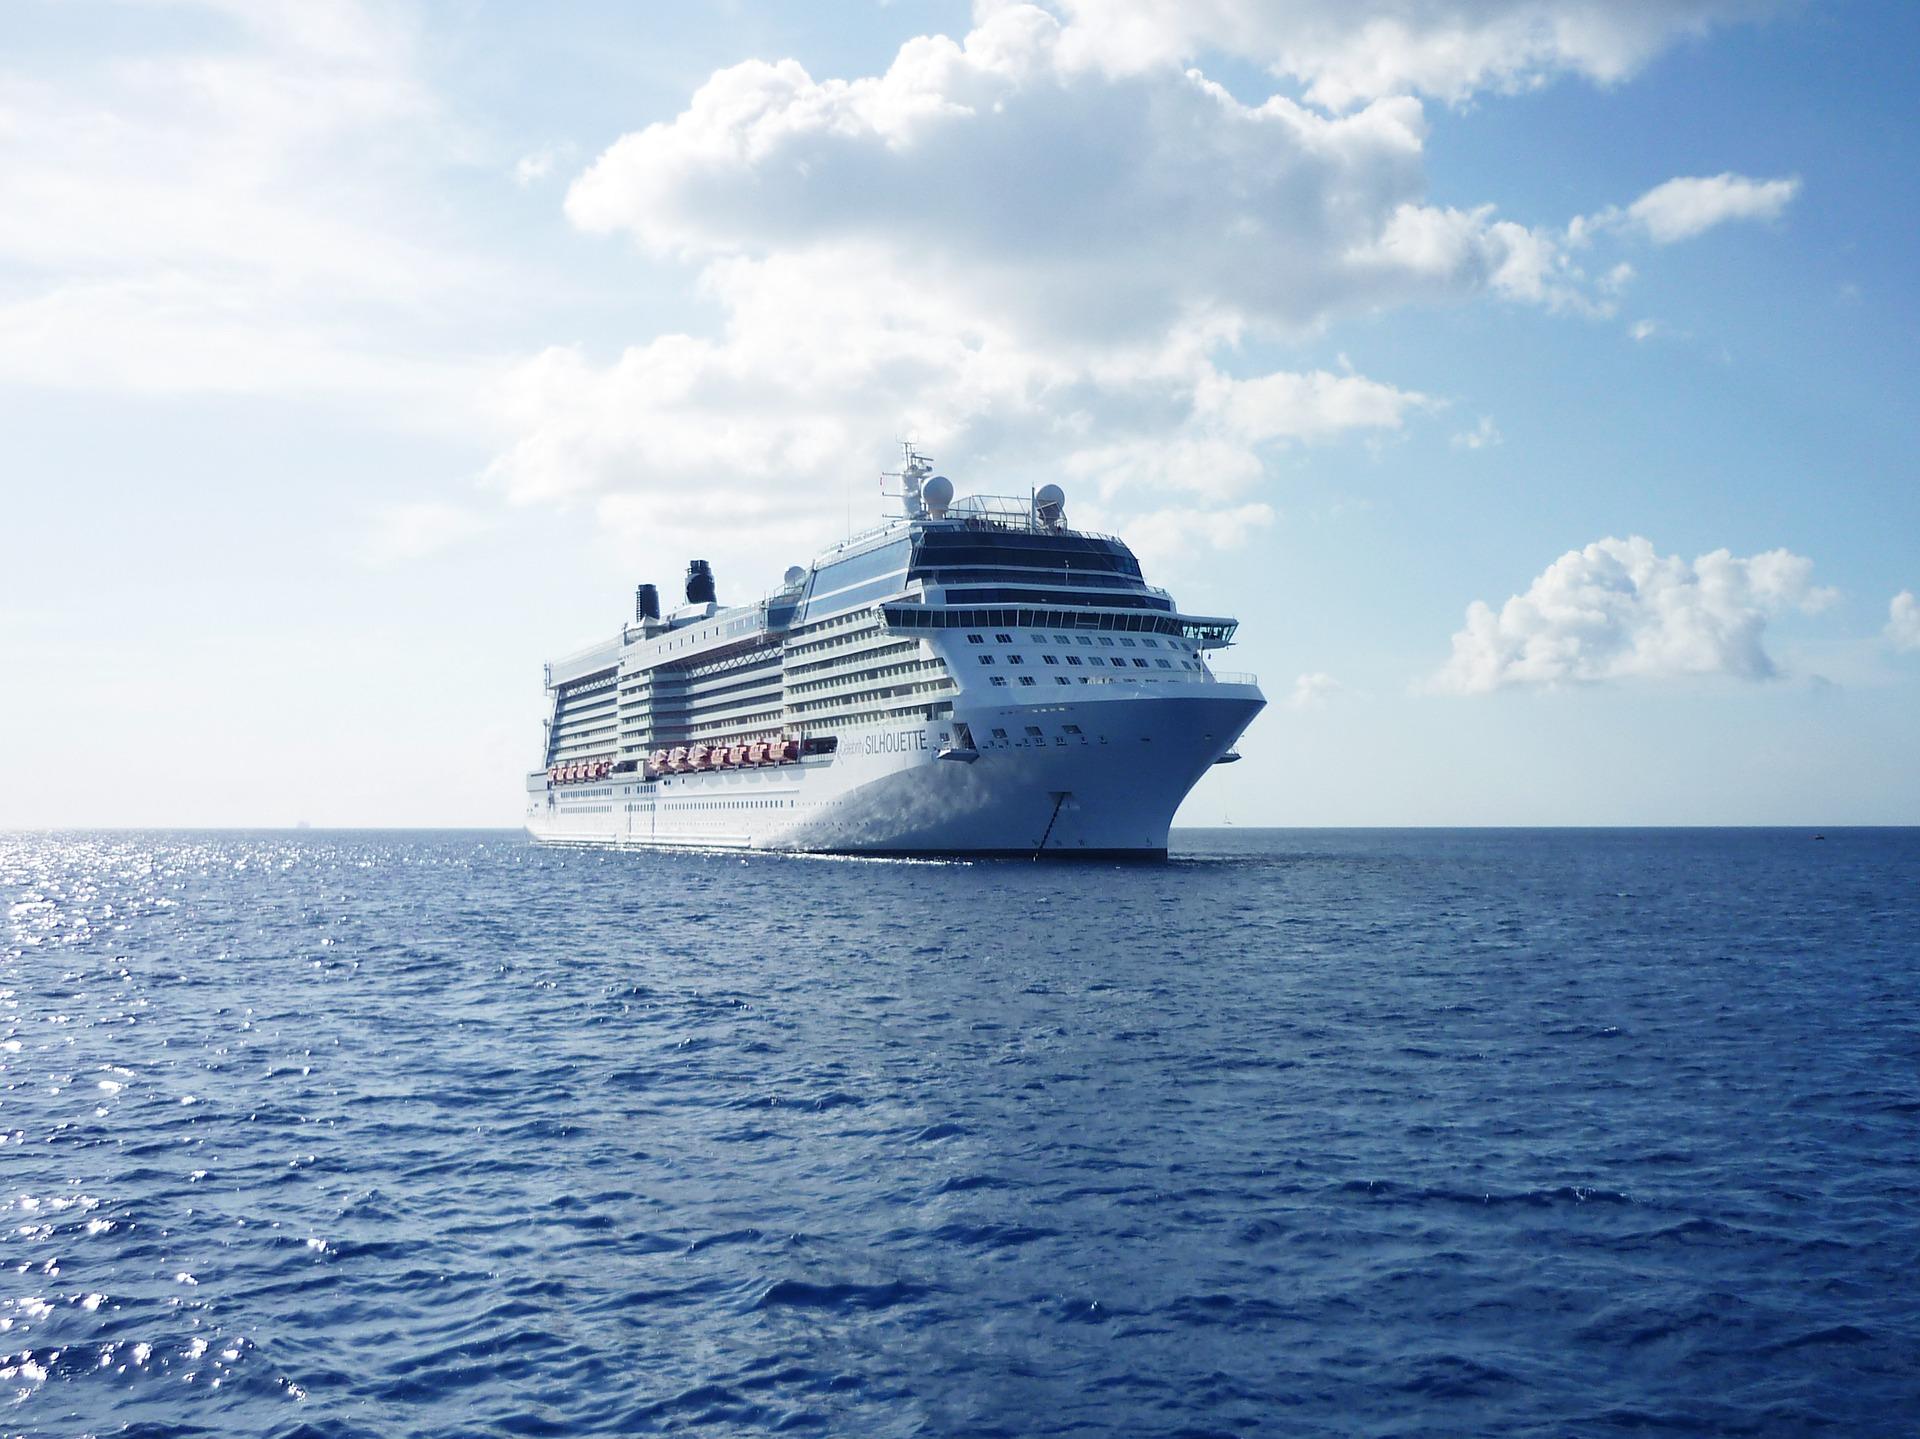 Distance Measure ship to ship